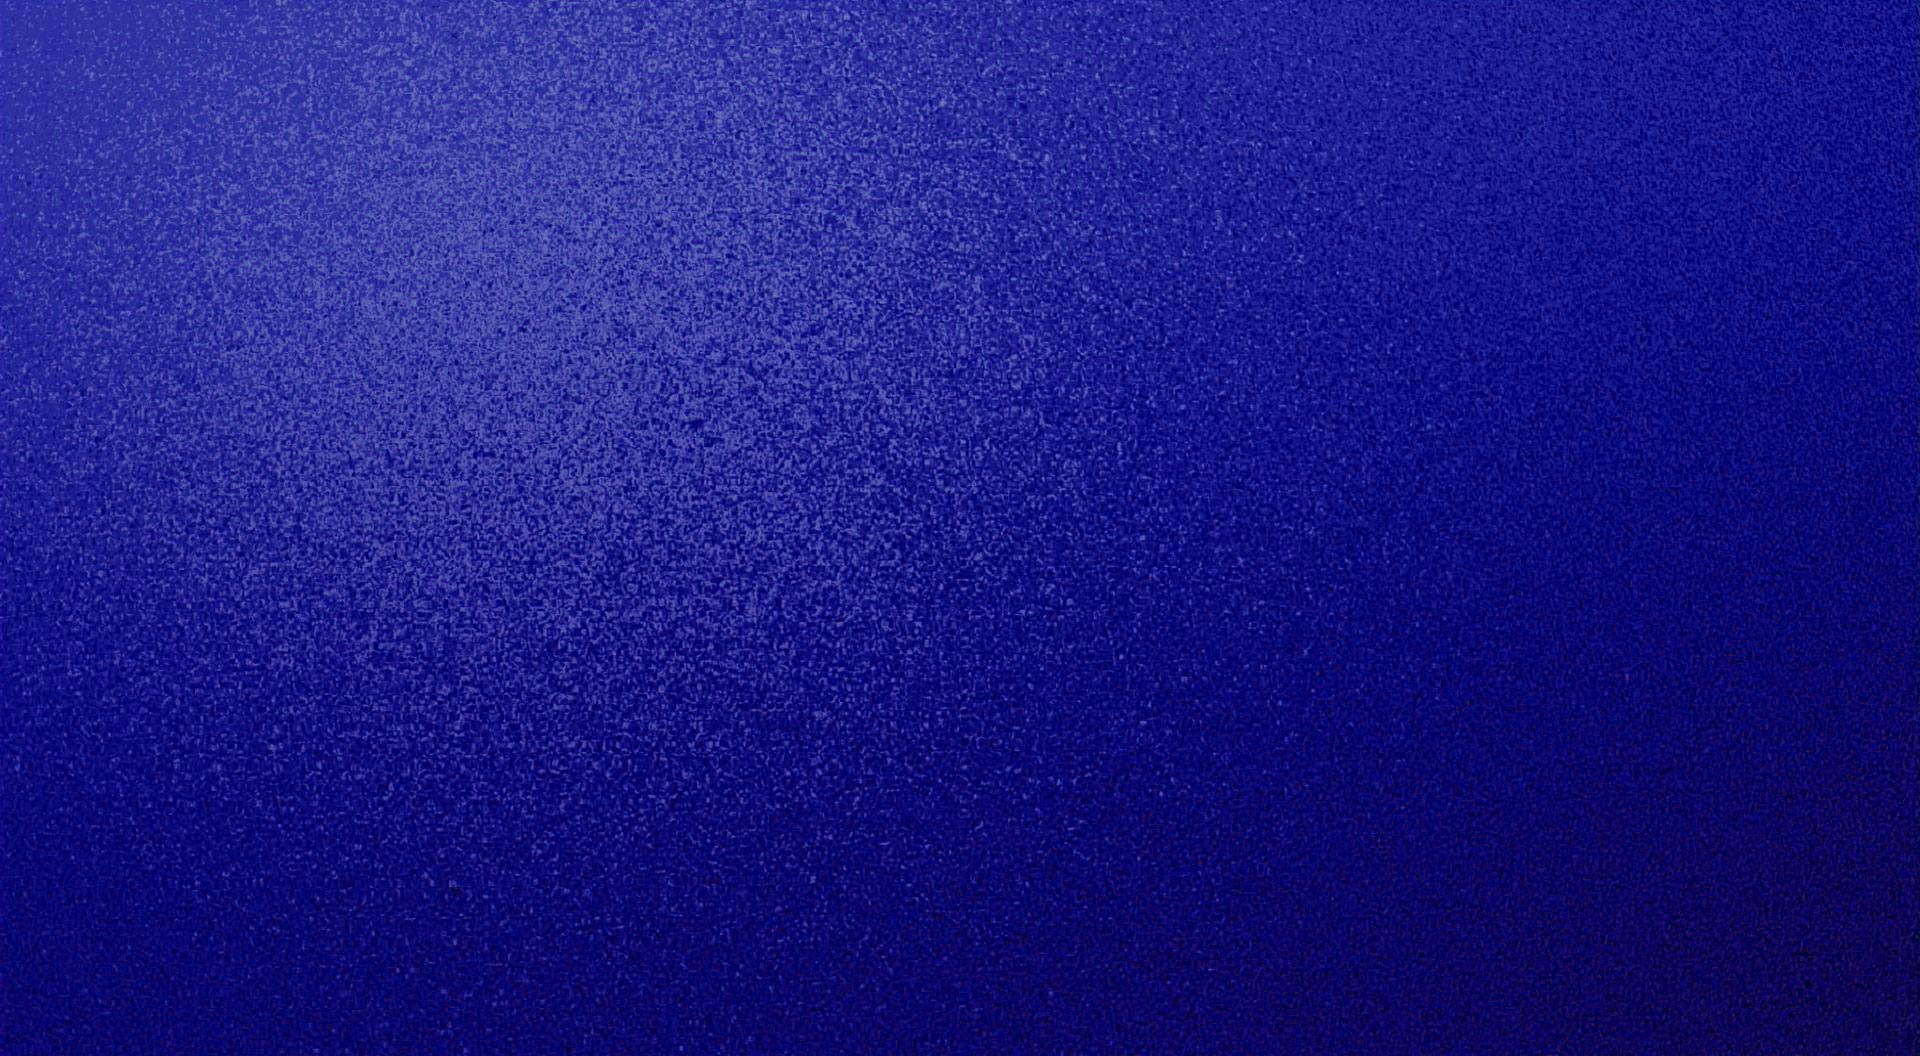 Cypress Bay Sound Of Thunder dark blue texture wallpaperjpg 1920x1056